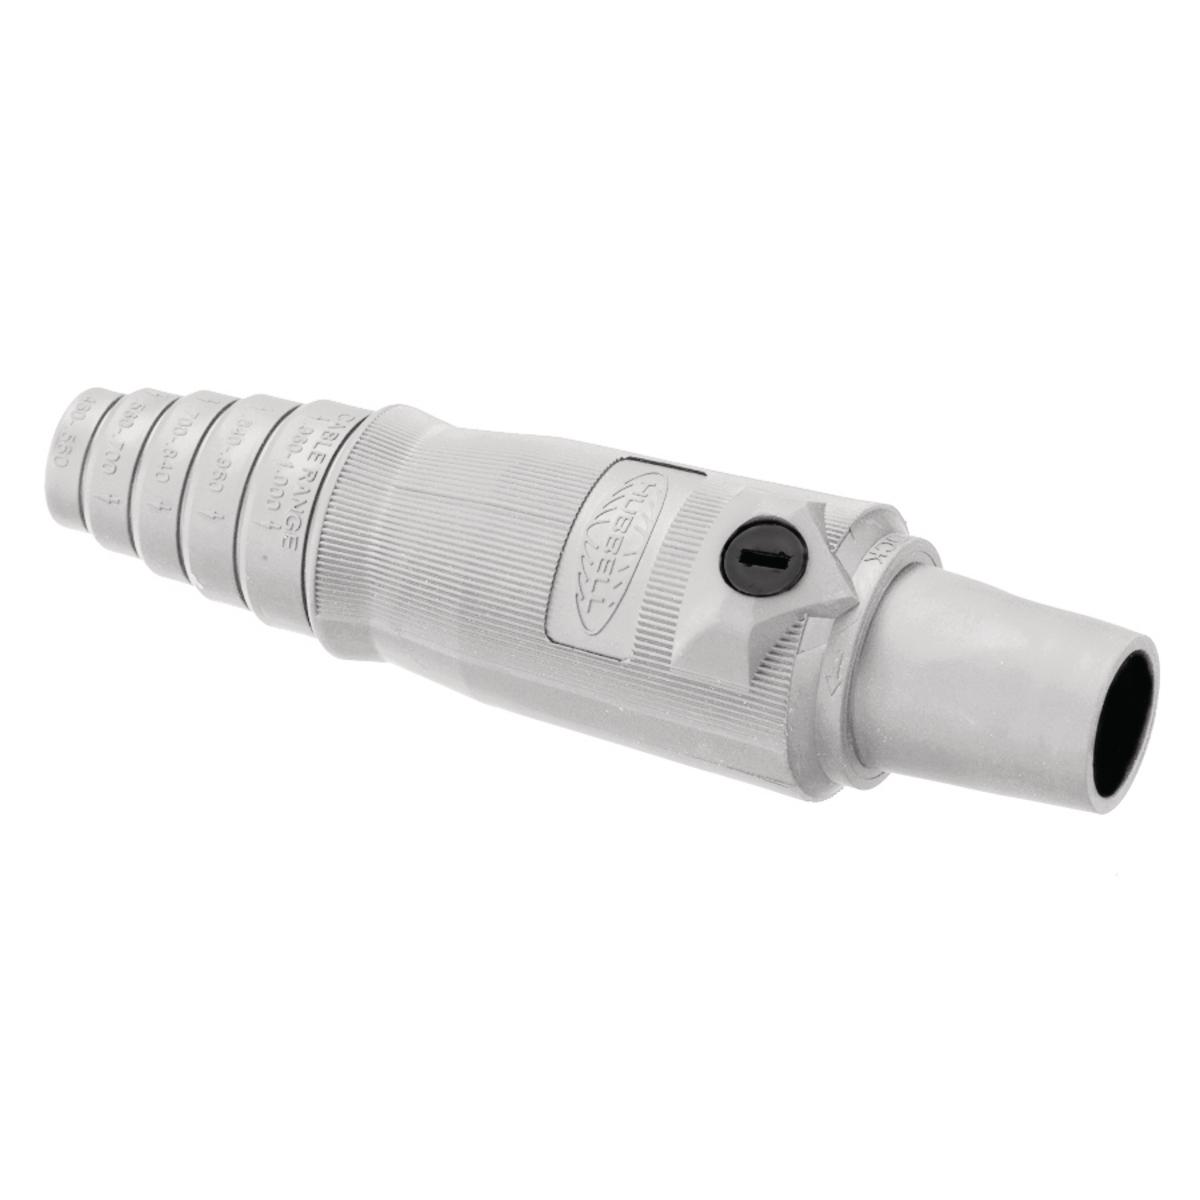 Hubbell HBL400FW 400 Amp 600 VAC 250 VDC 1-Pole White FeMale Plug